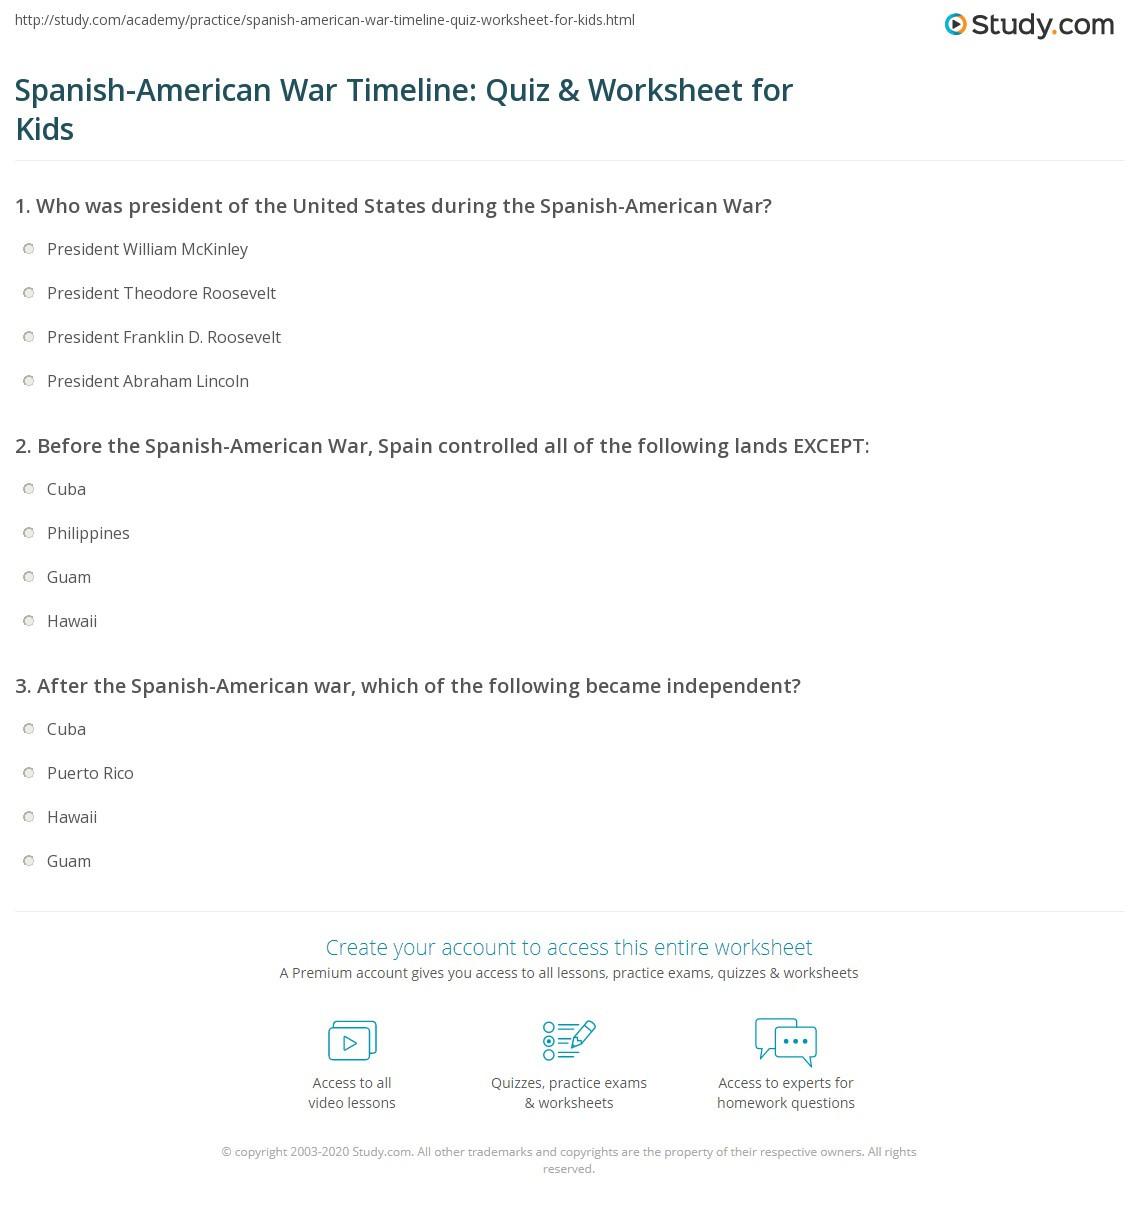 Spanish American War Timeline Quiz & Worksheet for Kids